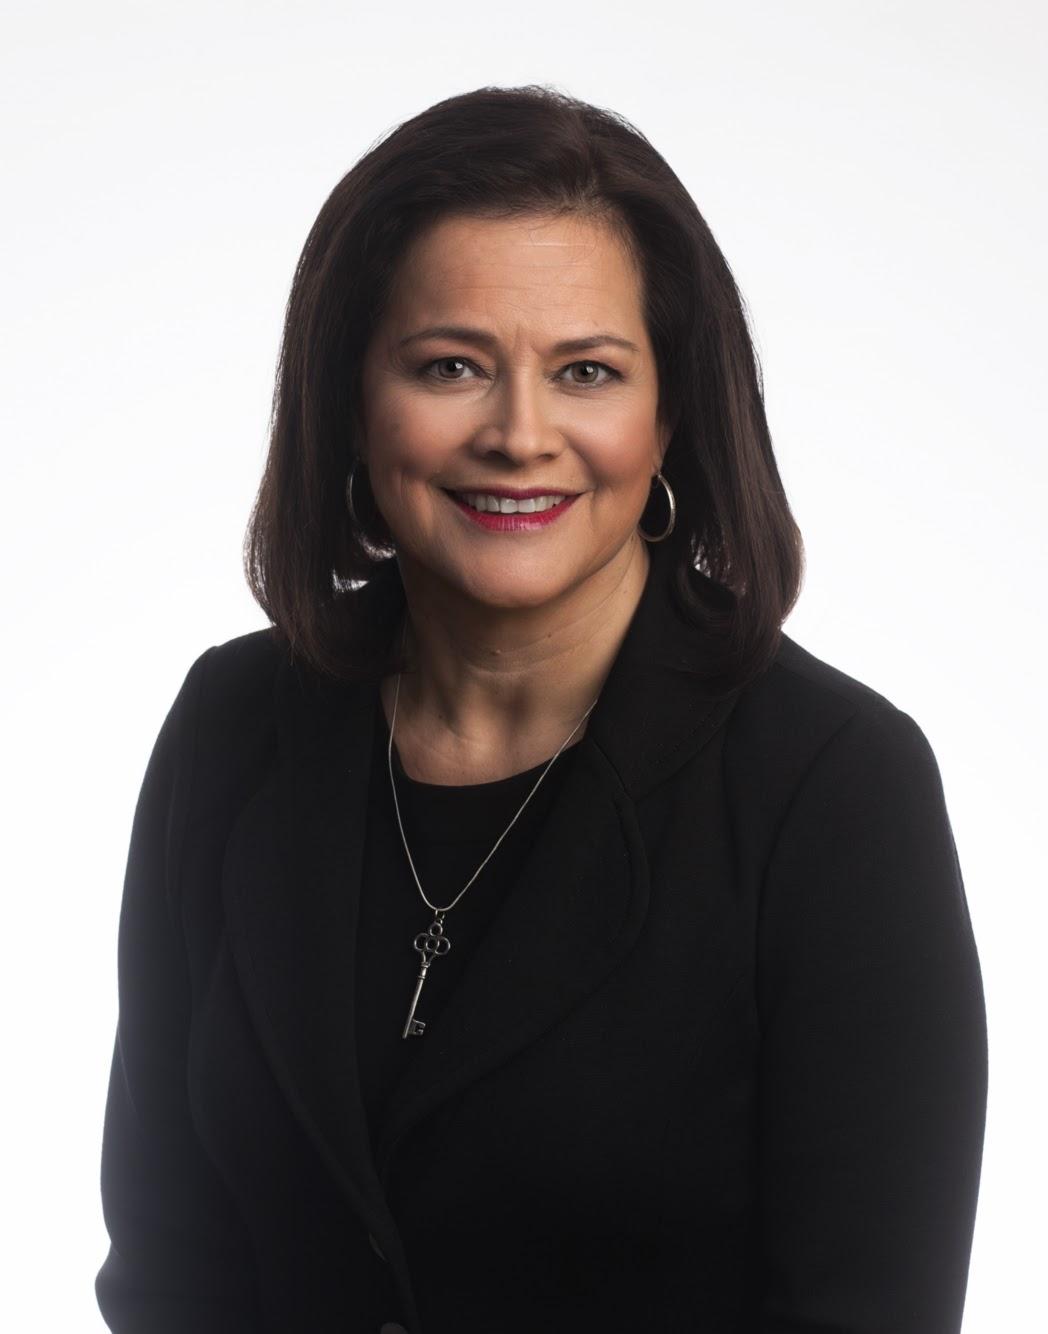 MARIANA COWAN